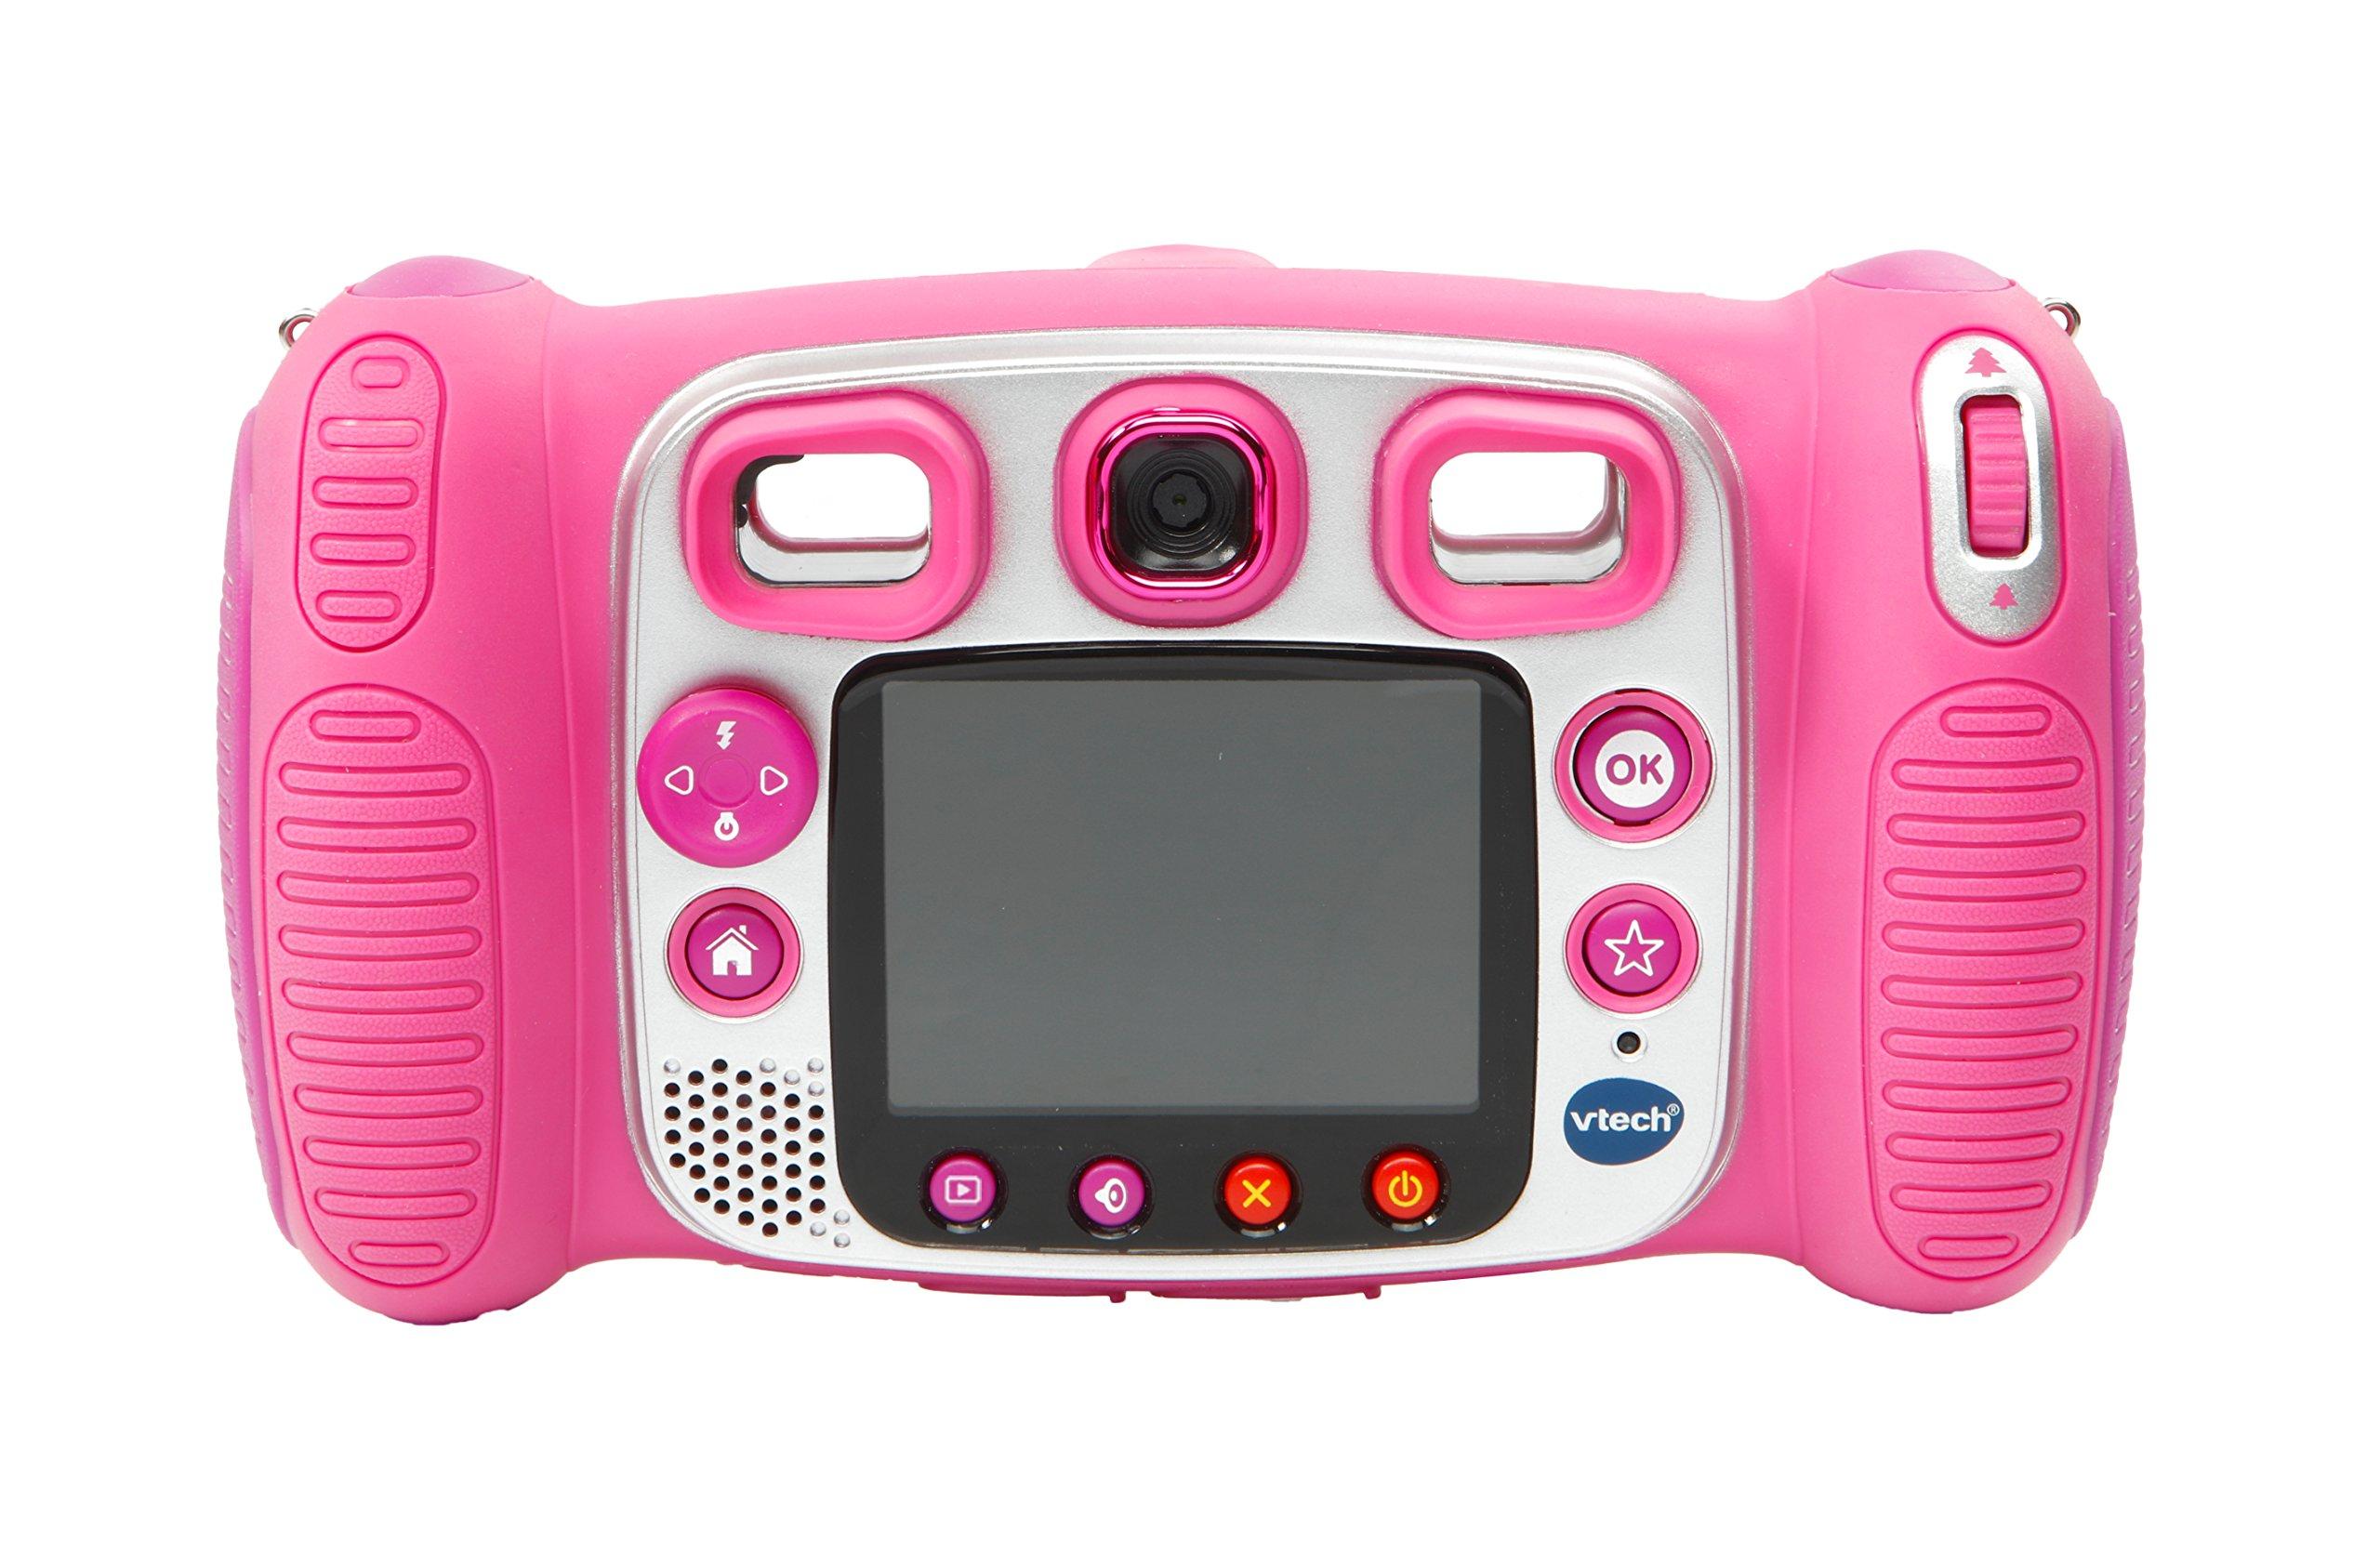 VTech Kidizoom Duo 5.0 Camera Pink by VTech (Image #2)